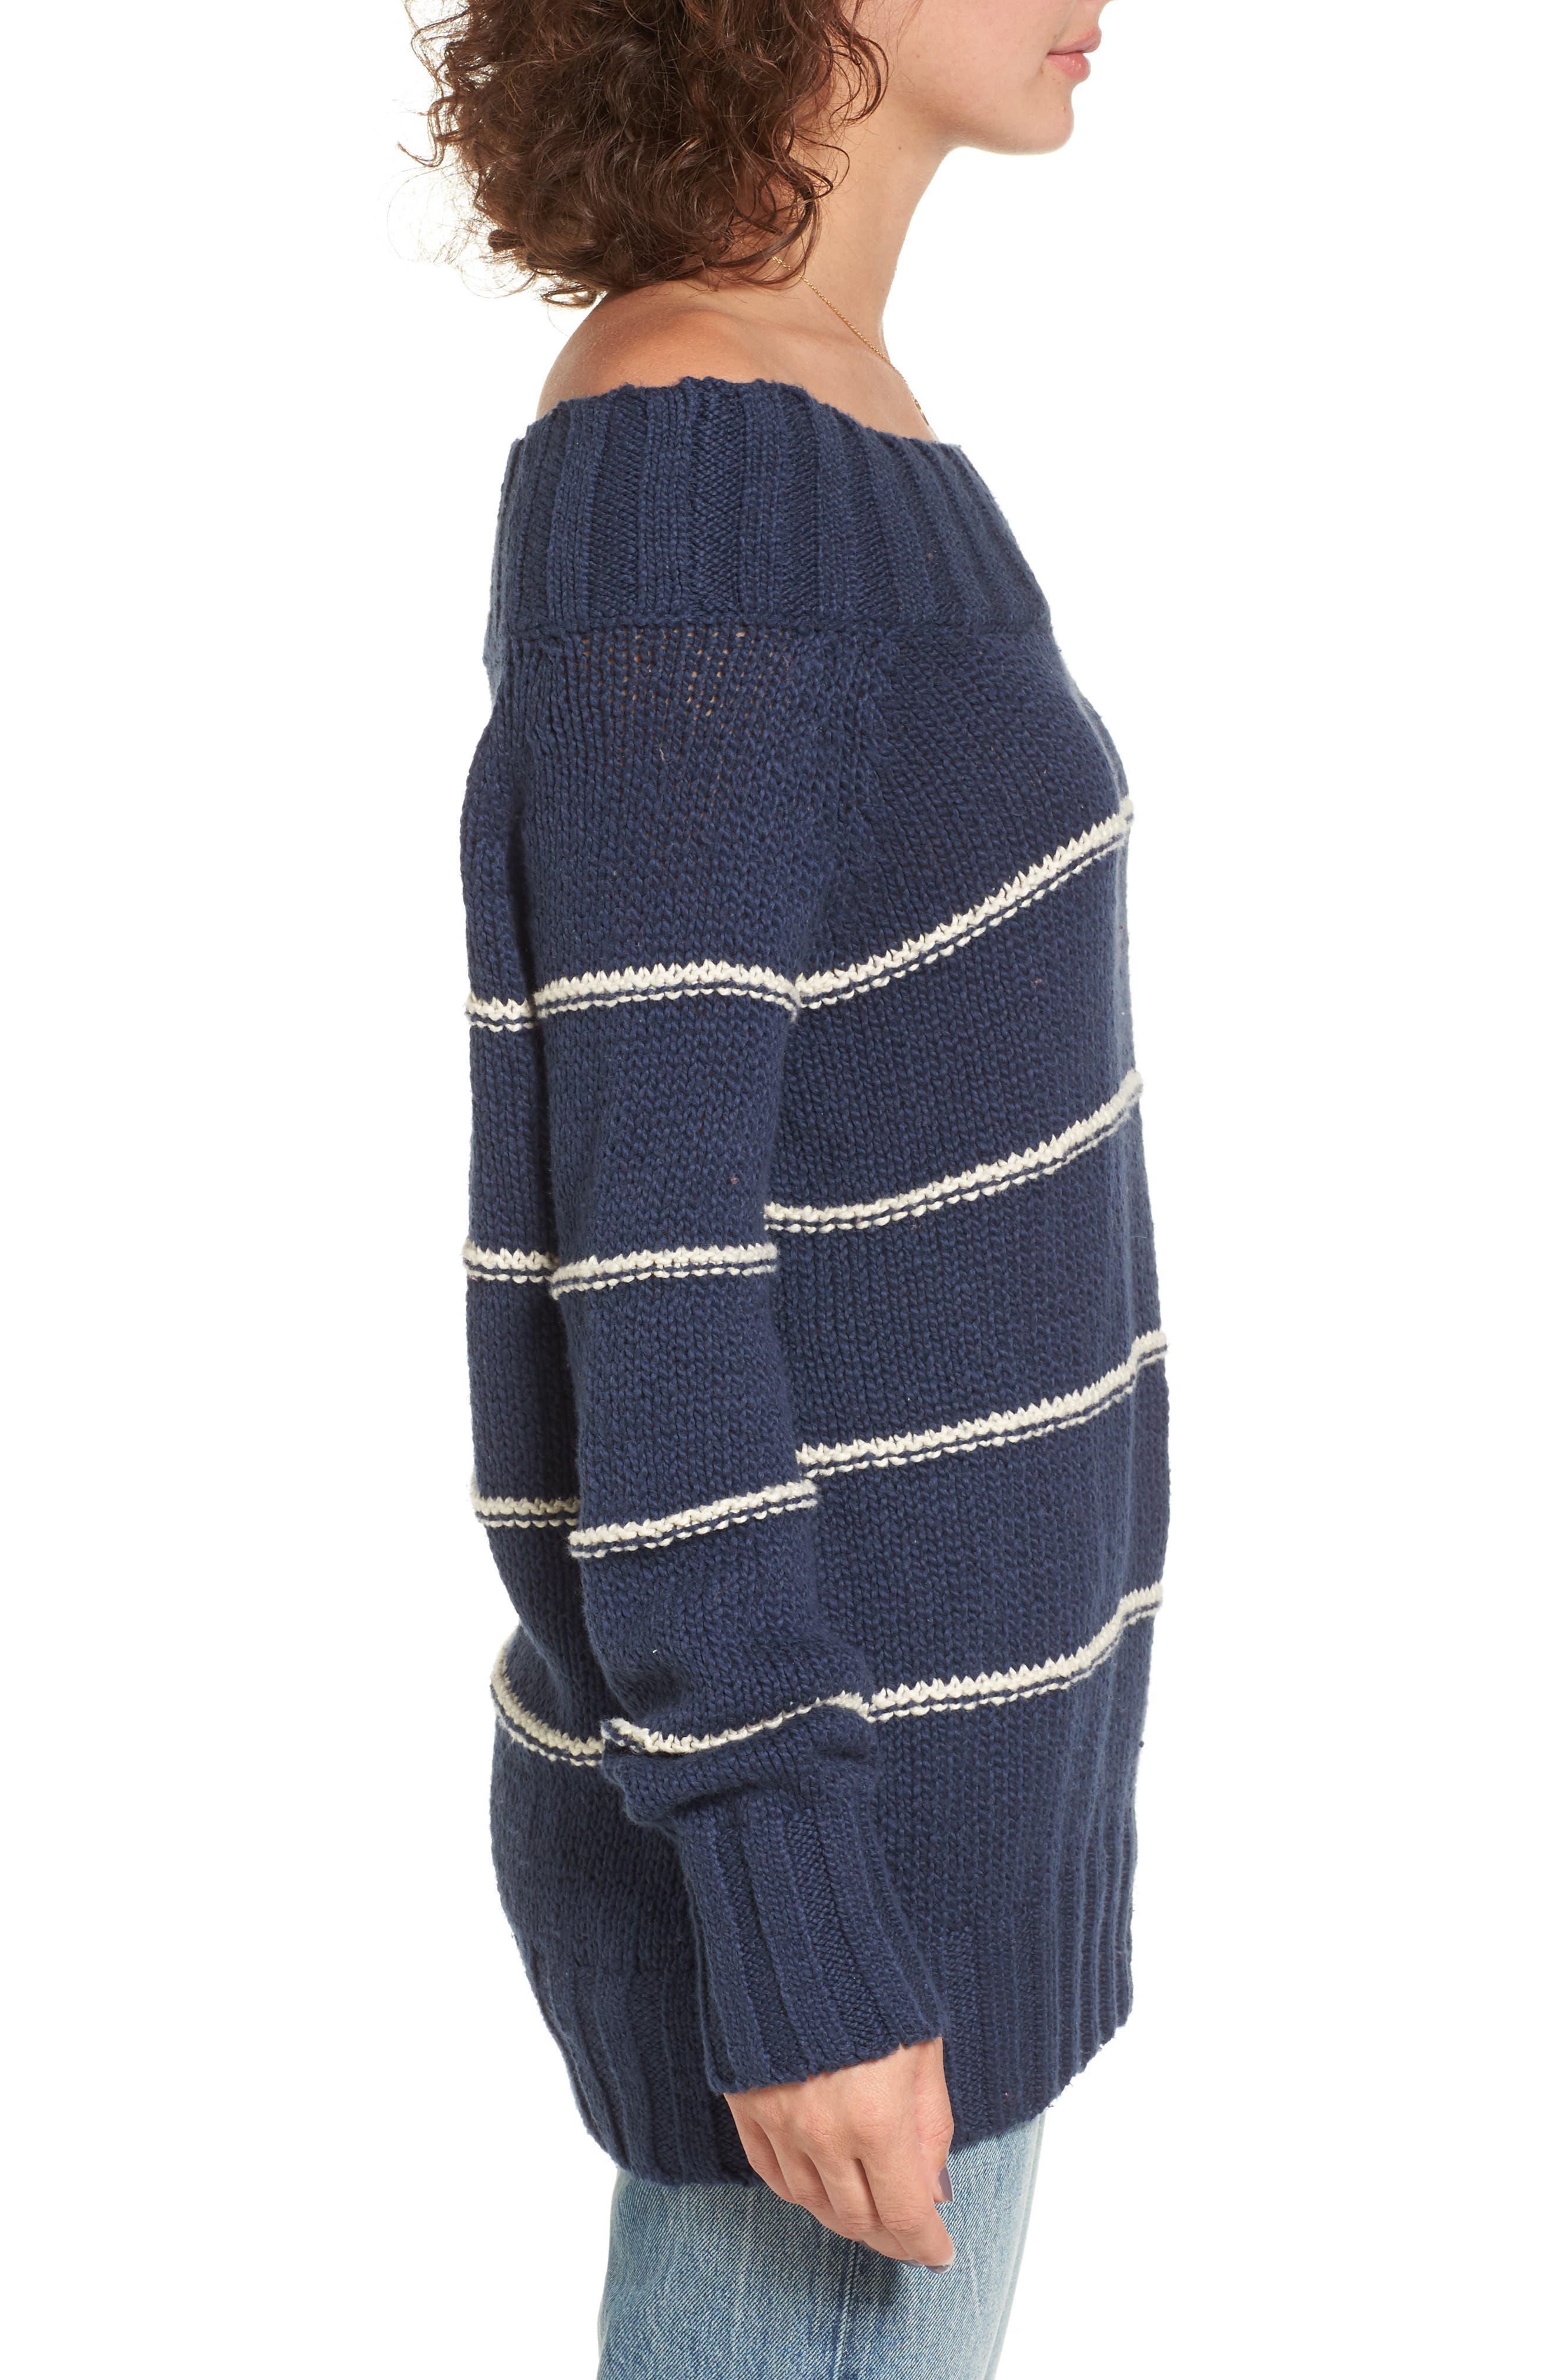 BILLABONG,                             Snuggle Down Off the Shoulder Sweater,                             Alternate thumbnail 3, color,                             400